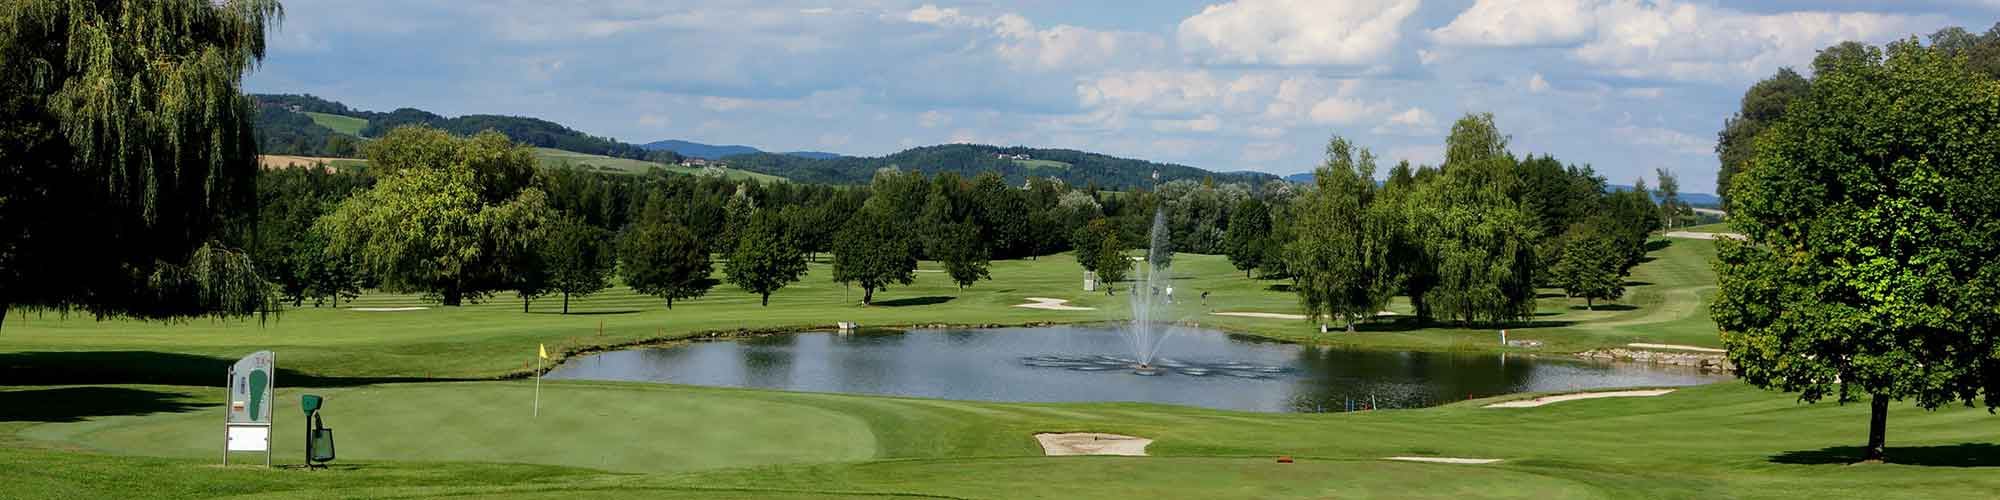 Golfanlage Holledau (Foto: Golfanlage Holledau)